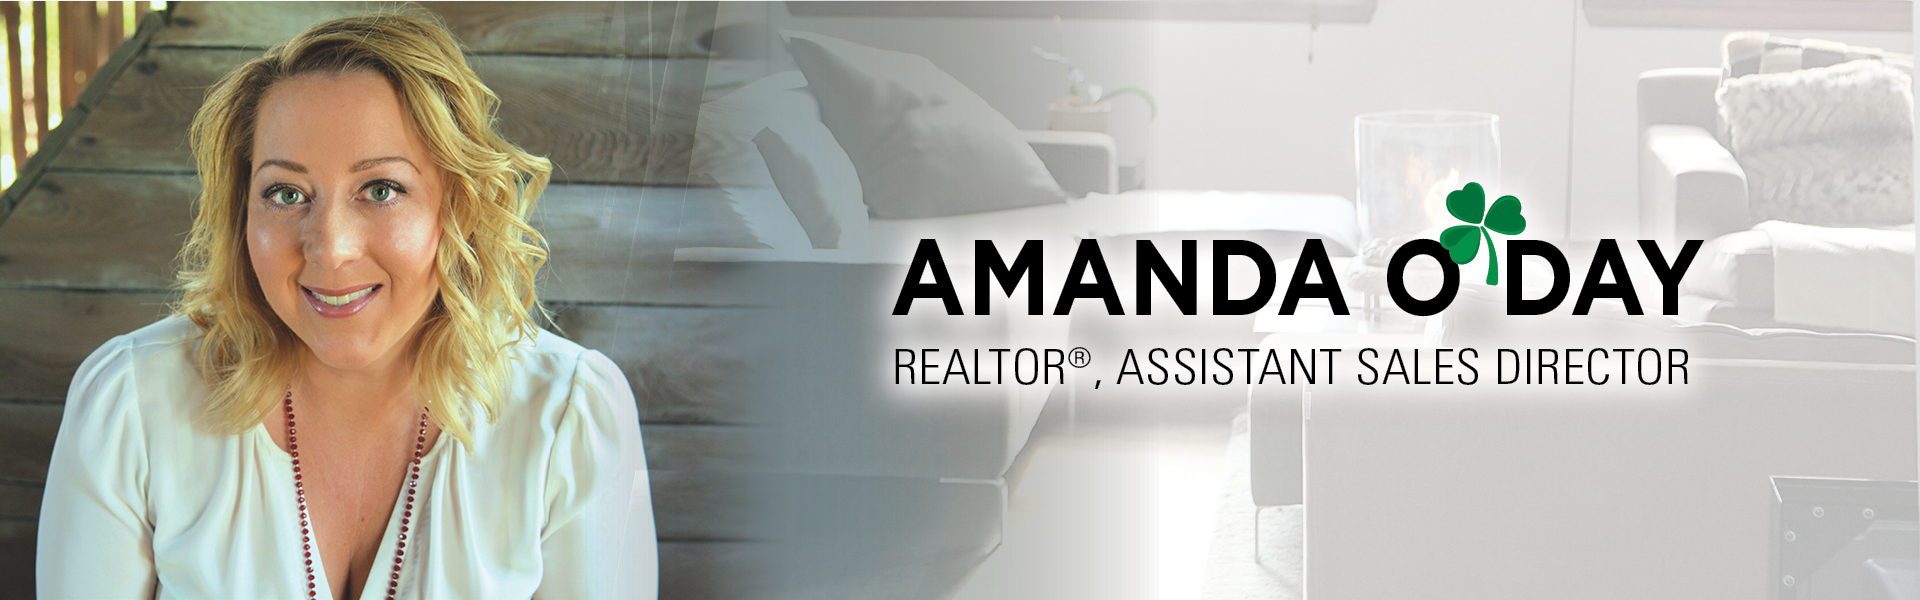 Amanda O'Day